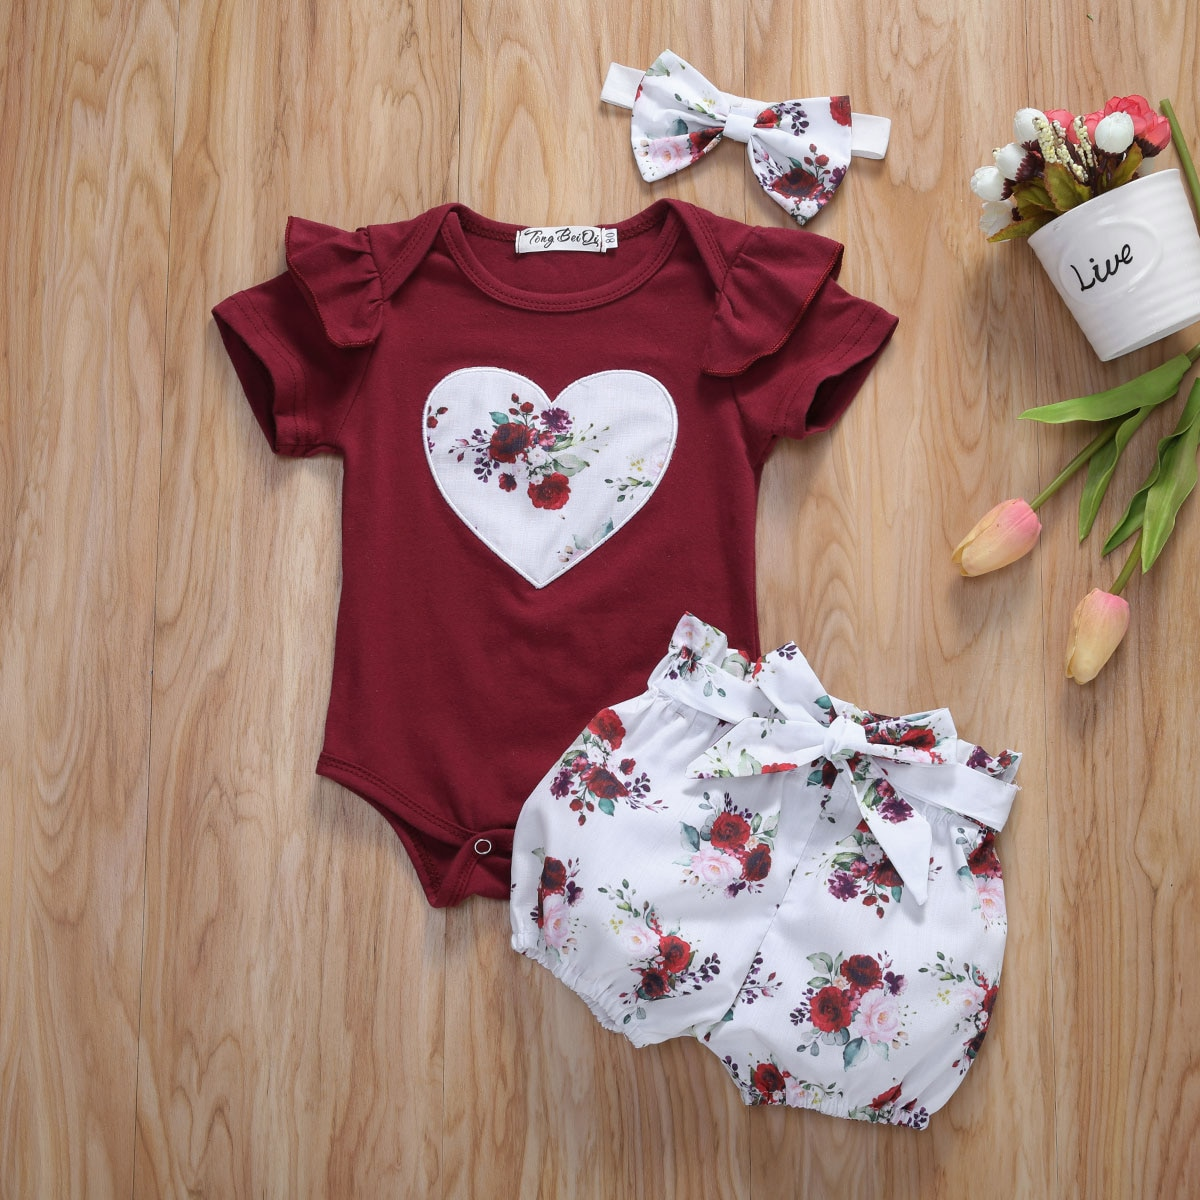 Pudcoco Newborn Baby Girl Clothes Flower Print Peach Heart Short Sleeve Romper Tops Short Pants Headband 3Pcs Outfits Sunsuit